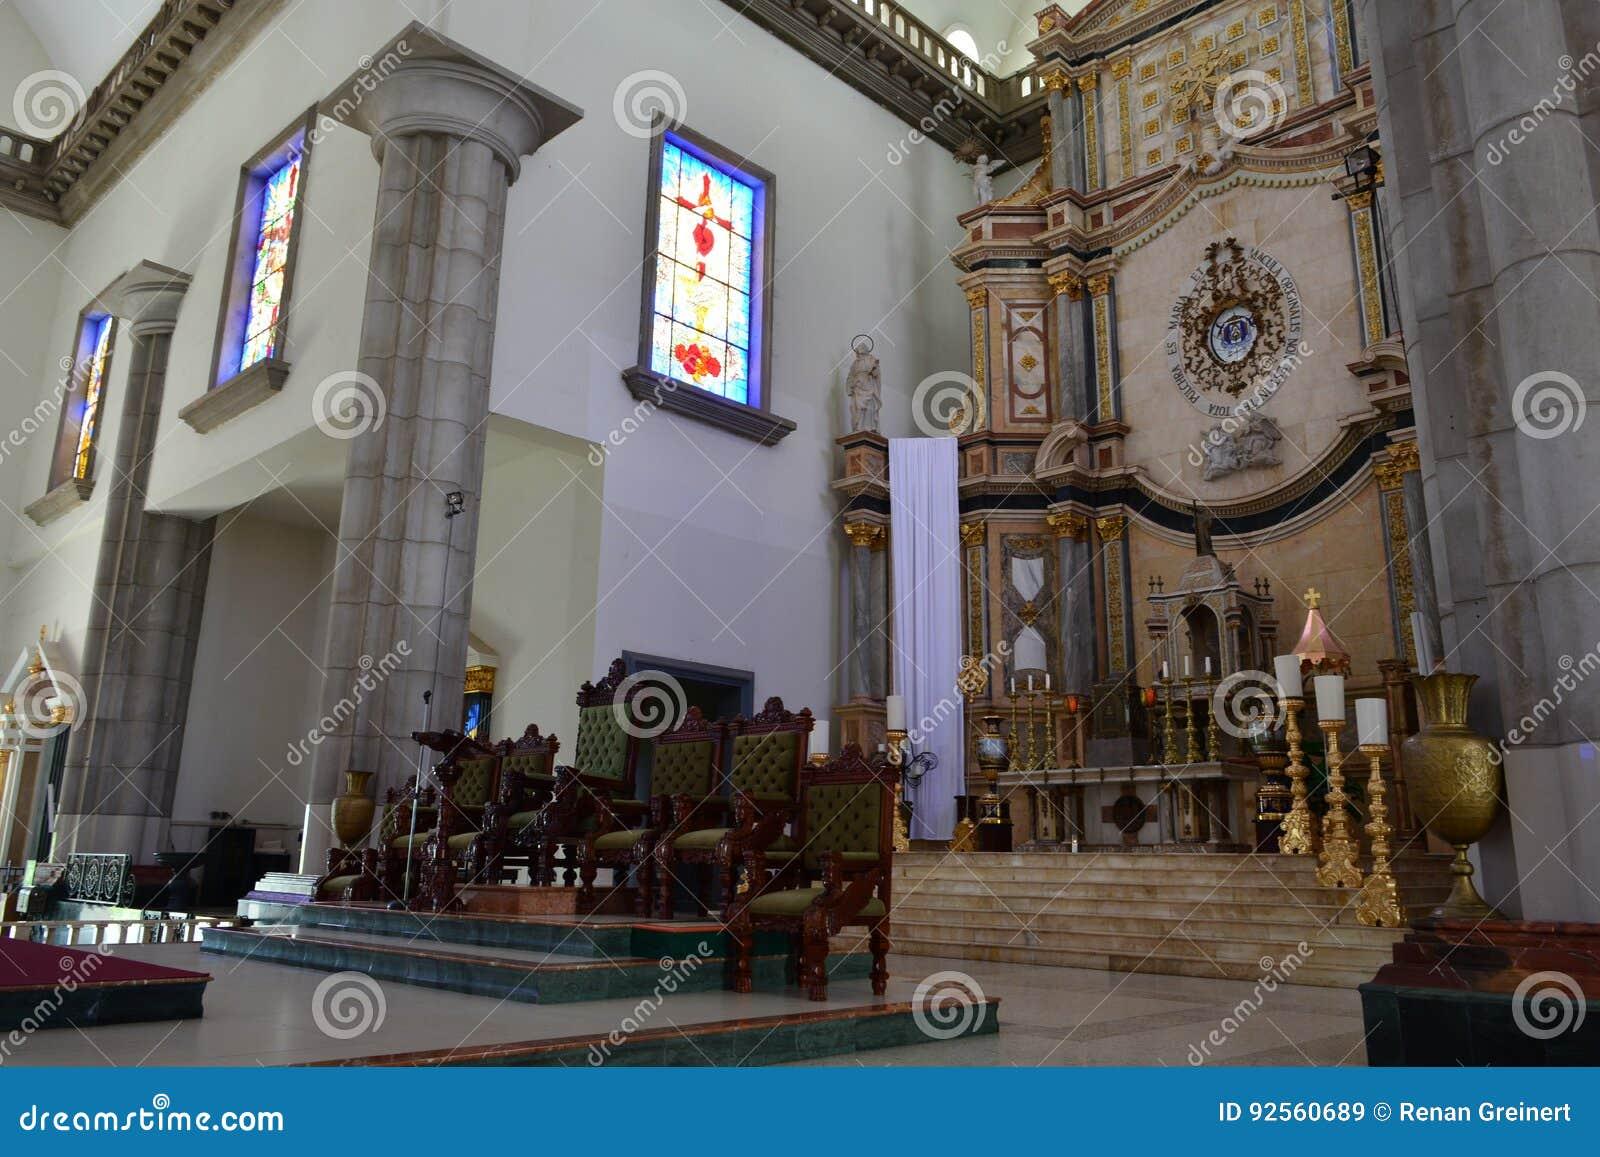 Innenraum der Basilika von Suyapa-Kirche in Tegucigalpa, Honduras